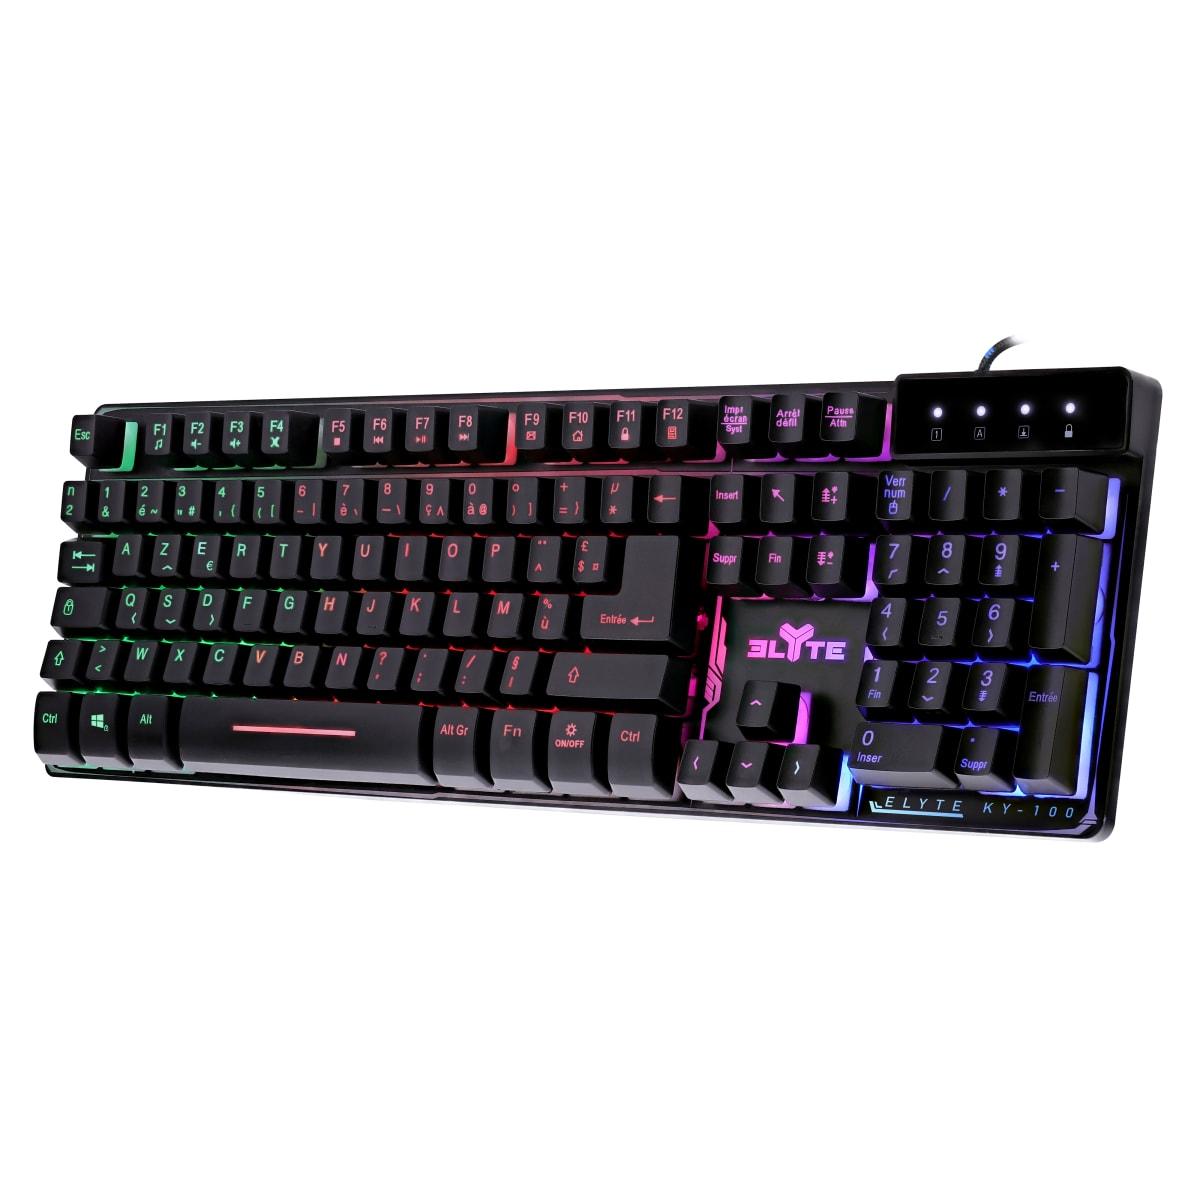 KY-100 semi-mechanical gaming keyboard